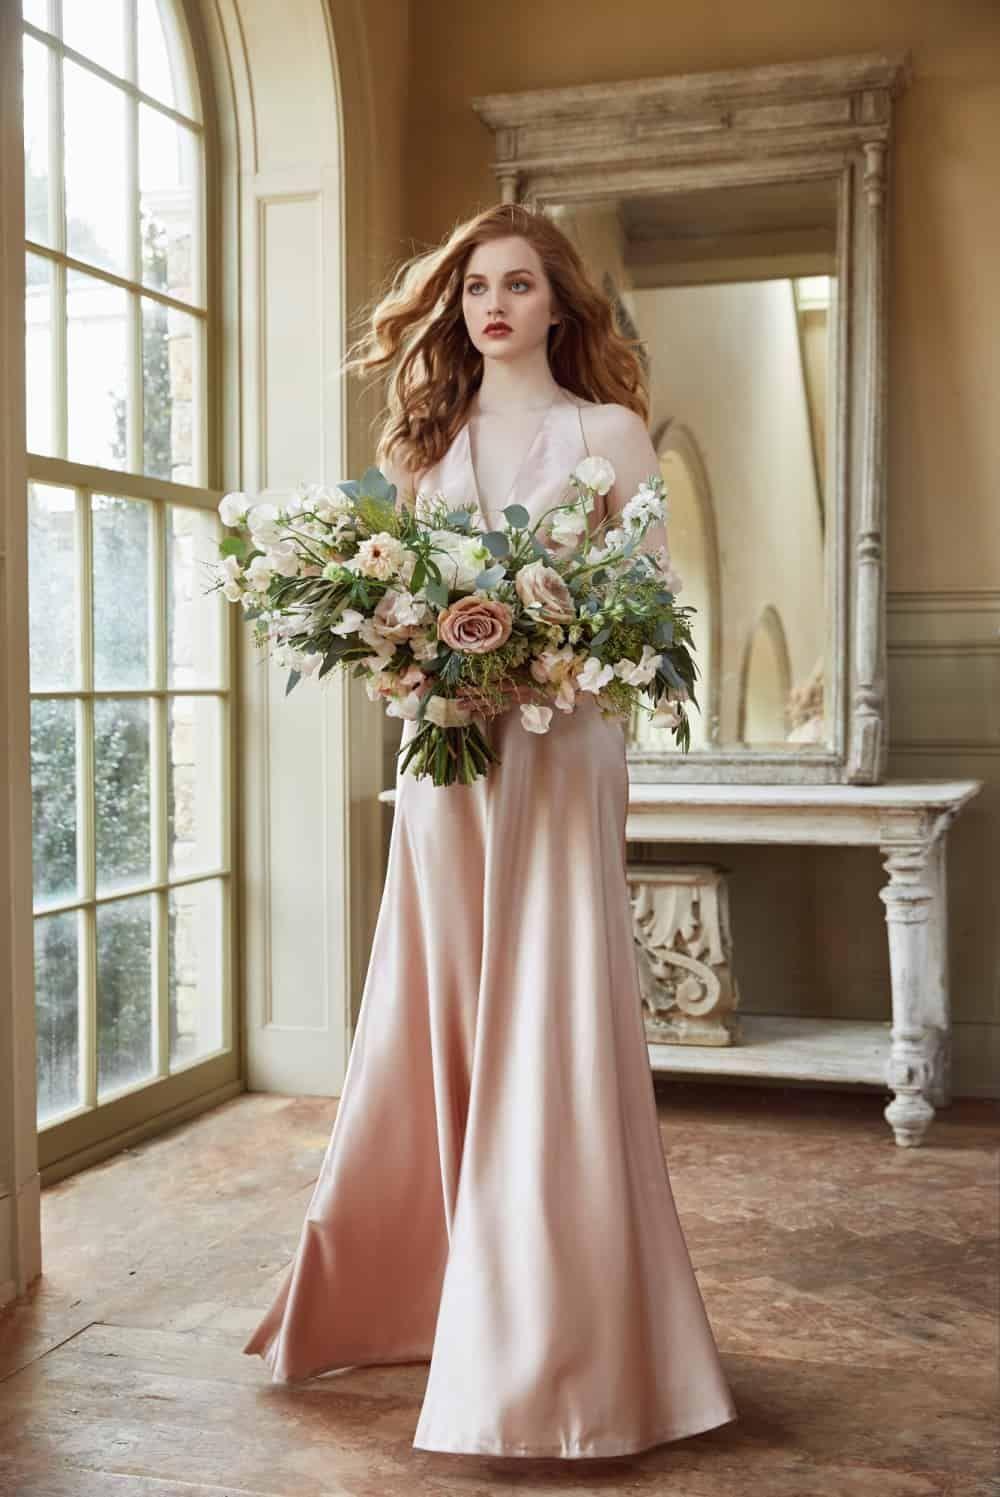 Blush Satin Crepe Bridesmaid Dress By Jenny Yoo Jennyyoo Bridesmaid Bridesmaiddresses Bridesmaid Dresses 2018 Wedding Dresses Satin Short Wedding Gowns [ 1497 x 1000 Pixel ]